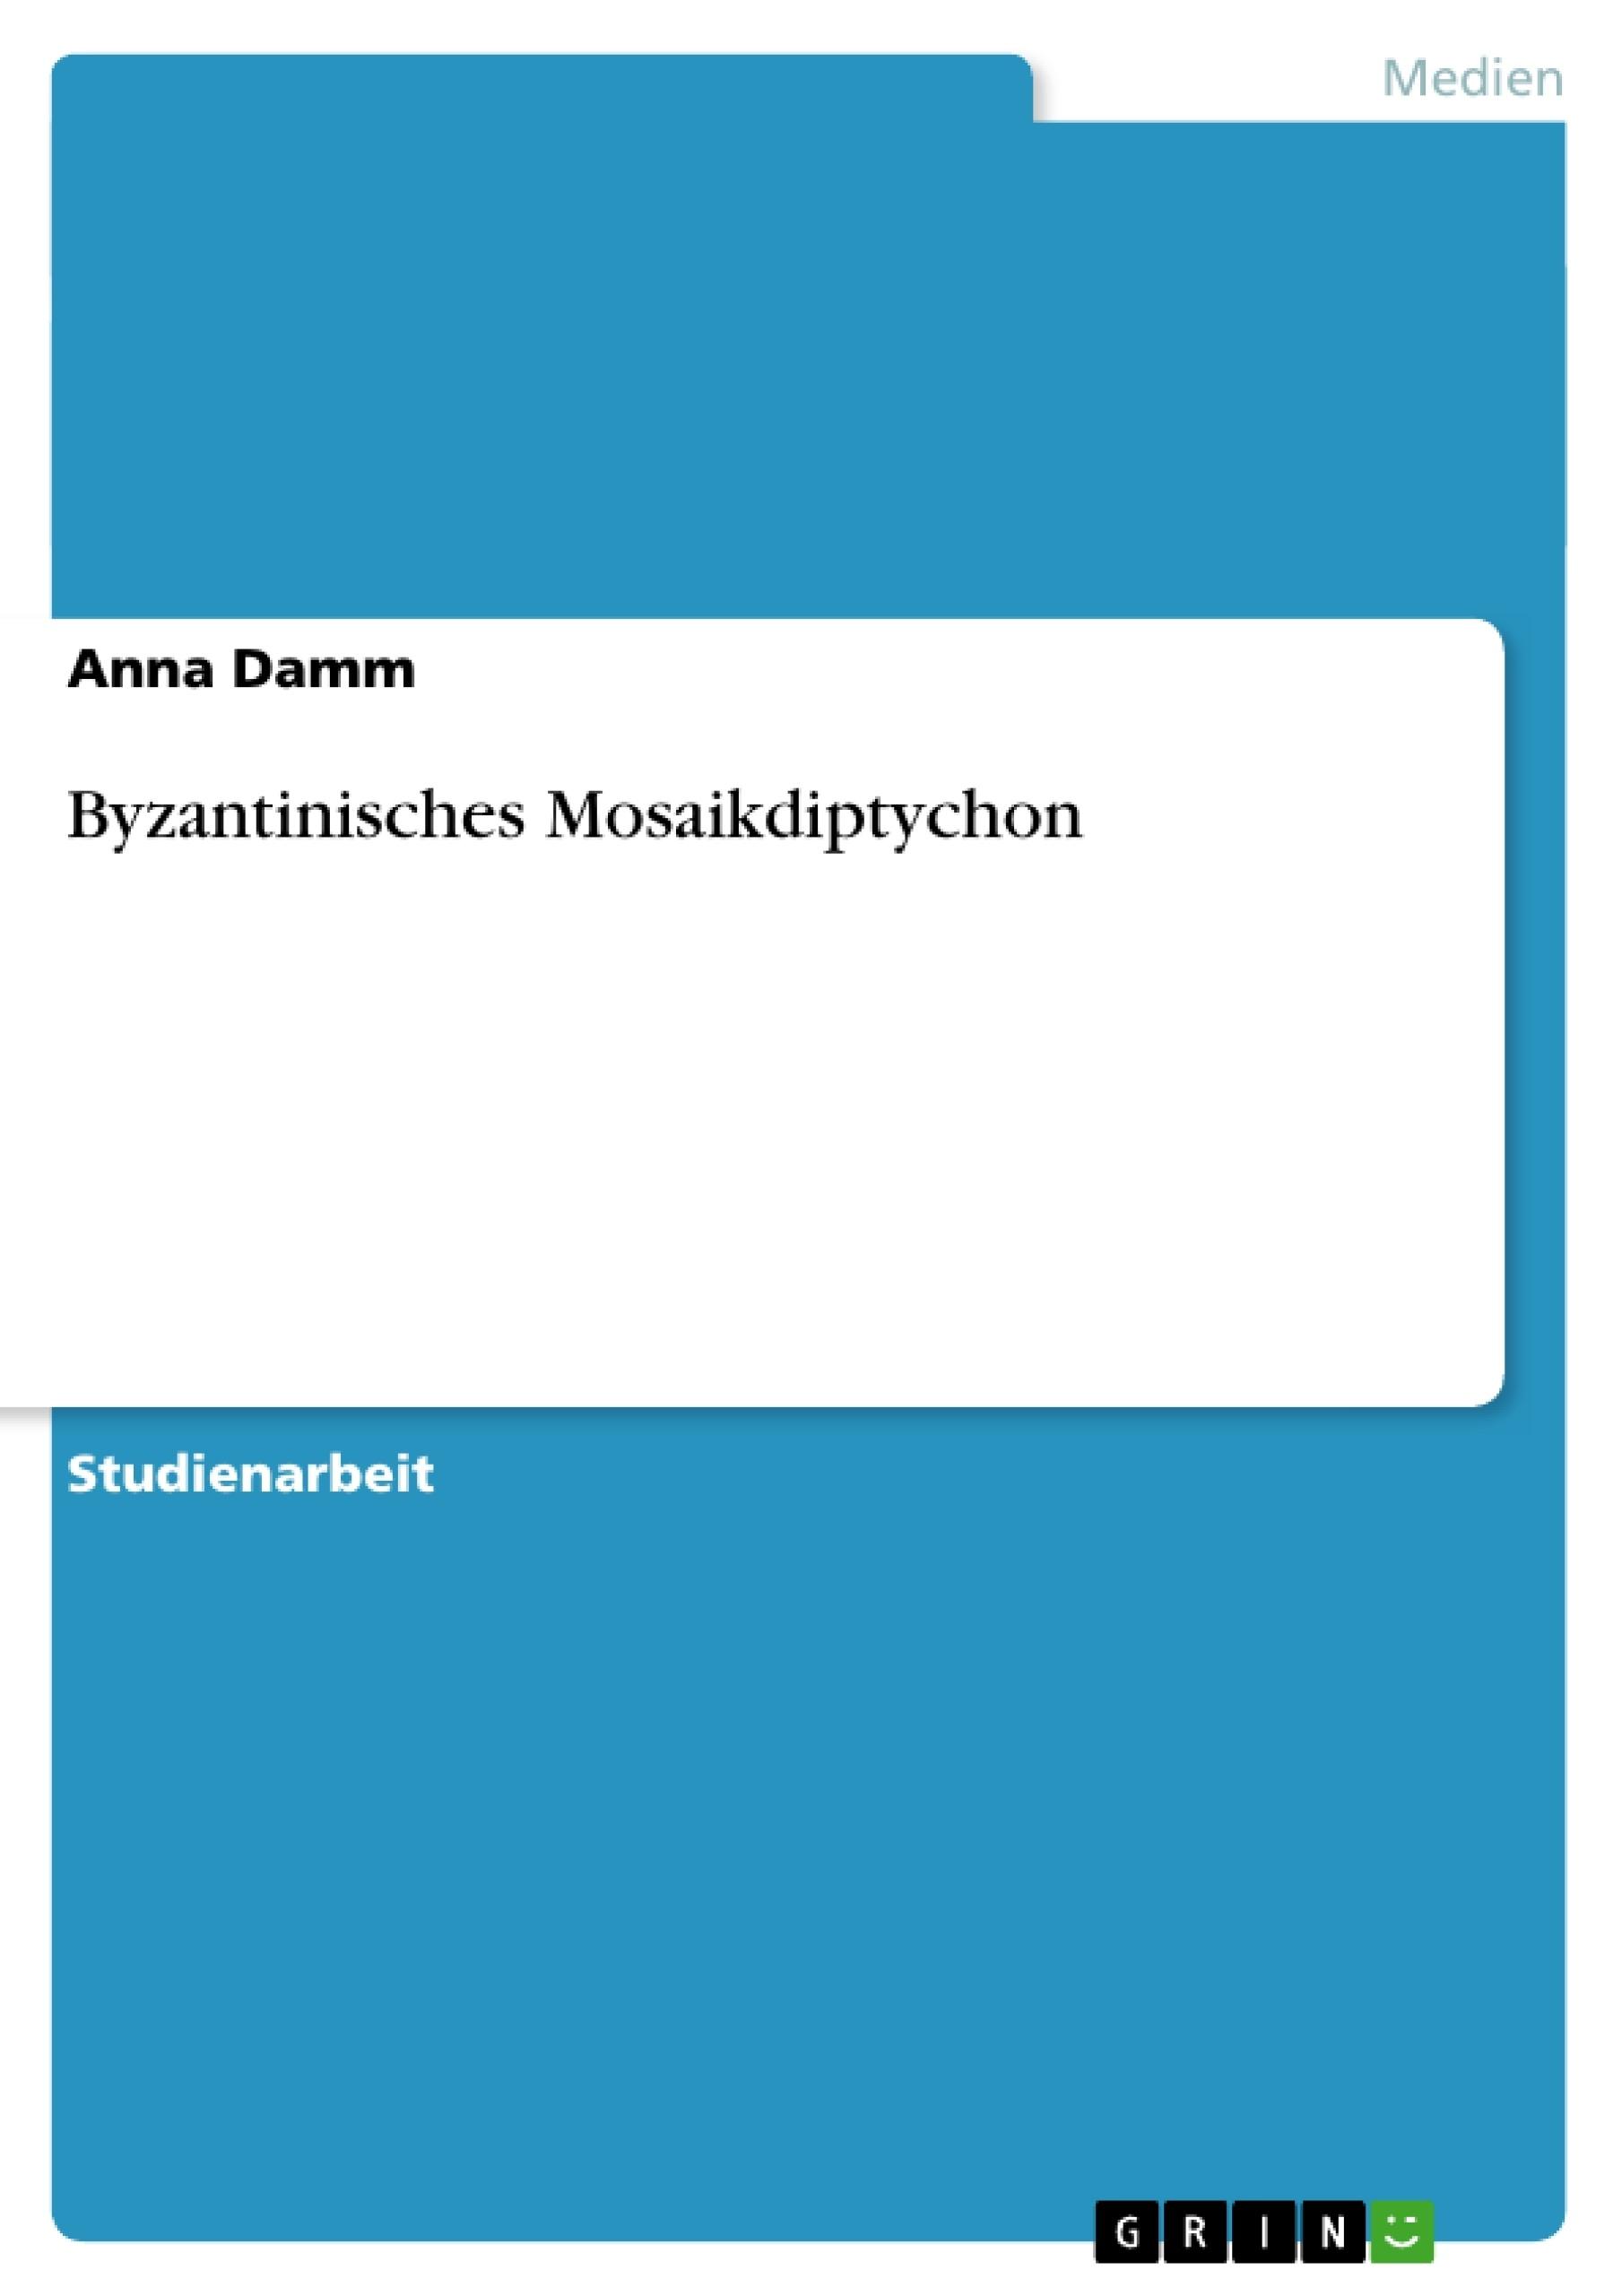 Titel: Byzantinisches Mosaikdiptychon